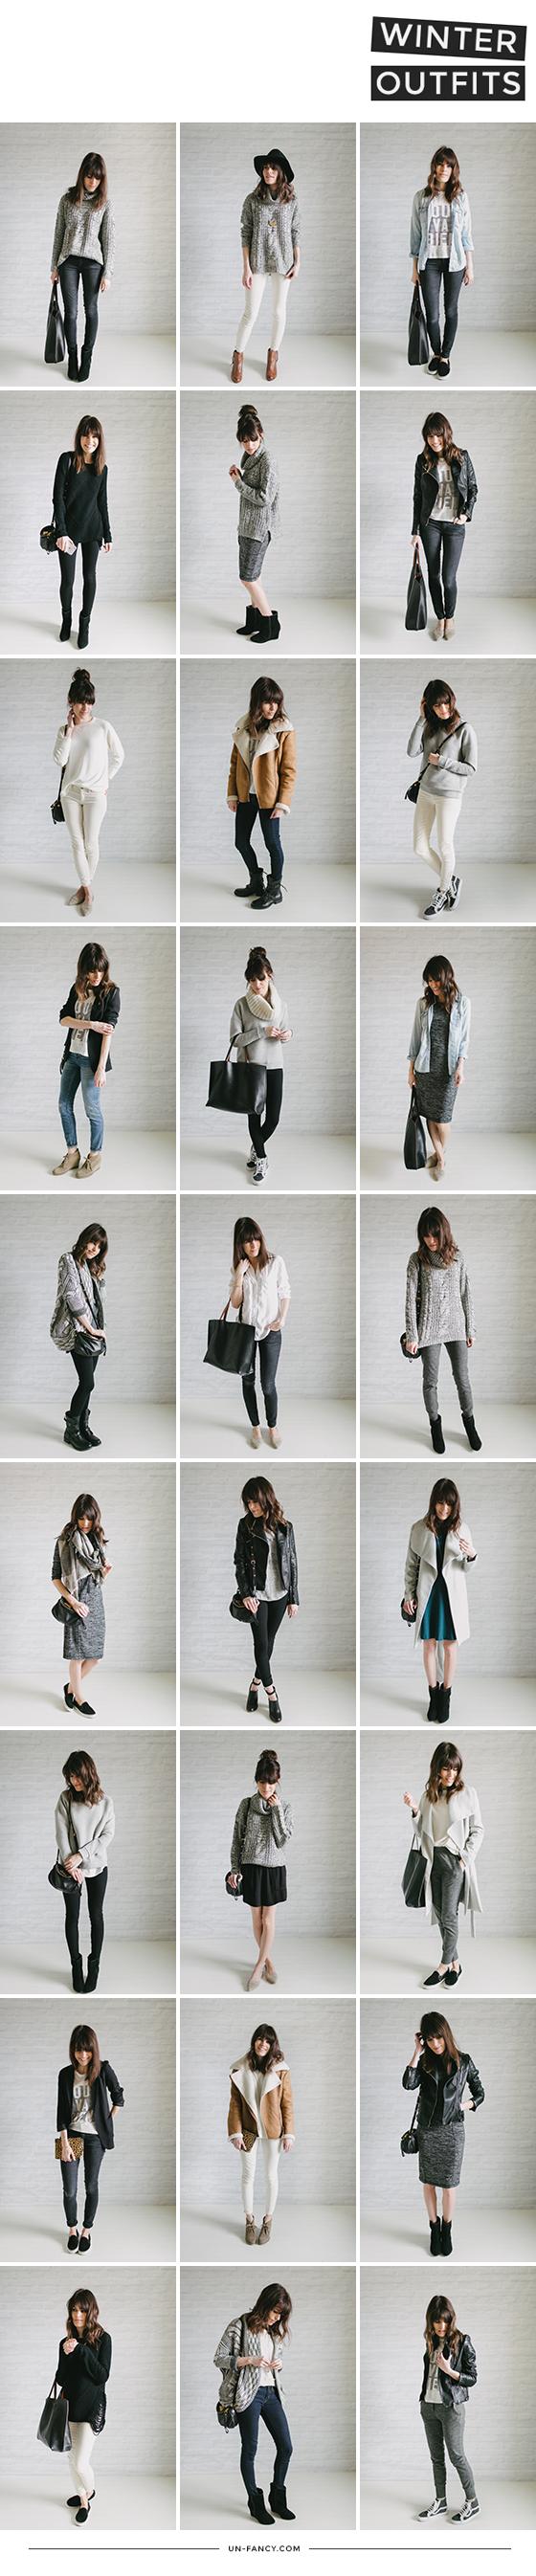 http://www.un-fancy.com/wp-content/uploads/2015/03/winteroutfits.jpg